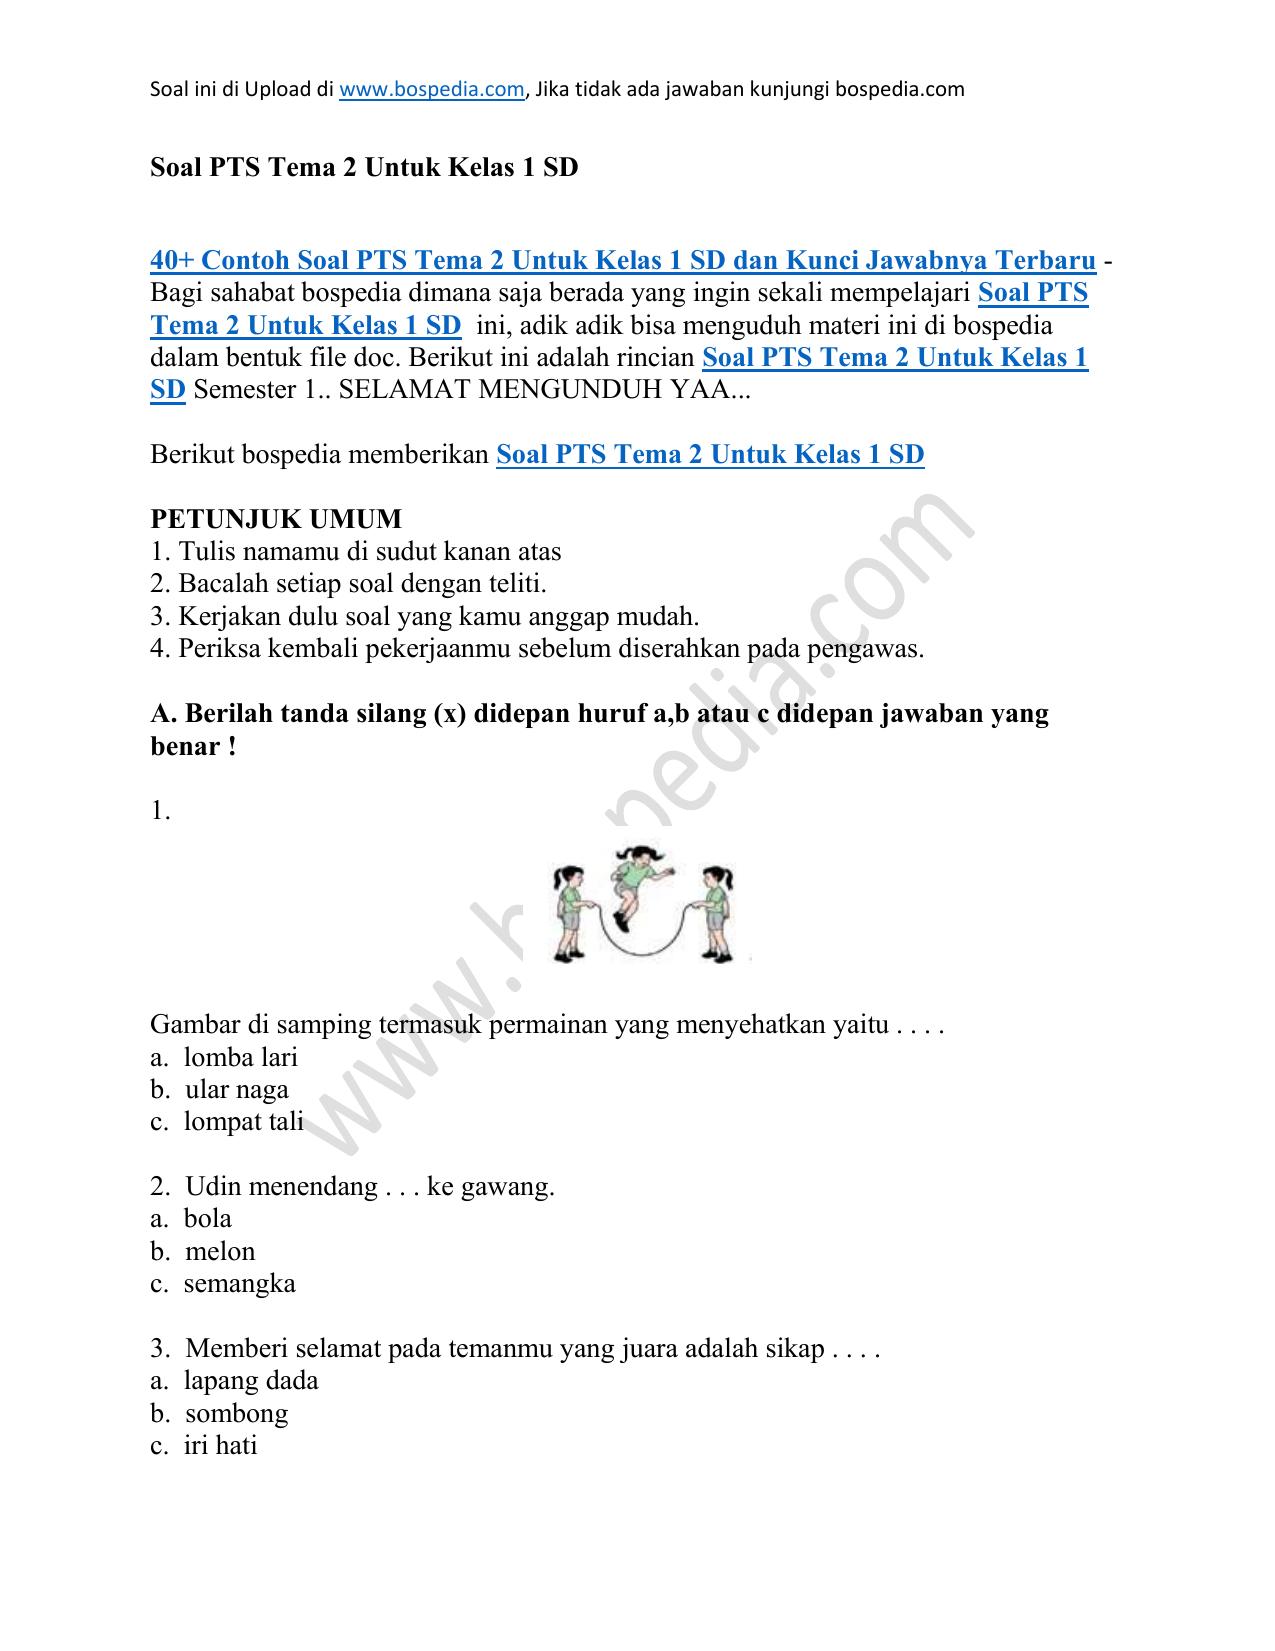 40 Contoh Soal Pts Tema 2 Untuk Kelas 1 Sd Dan Kunci Jawabnya